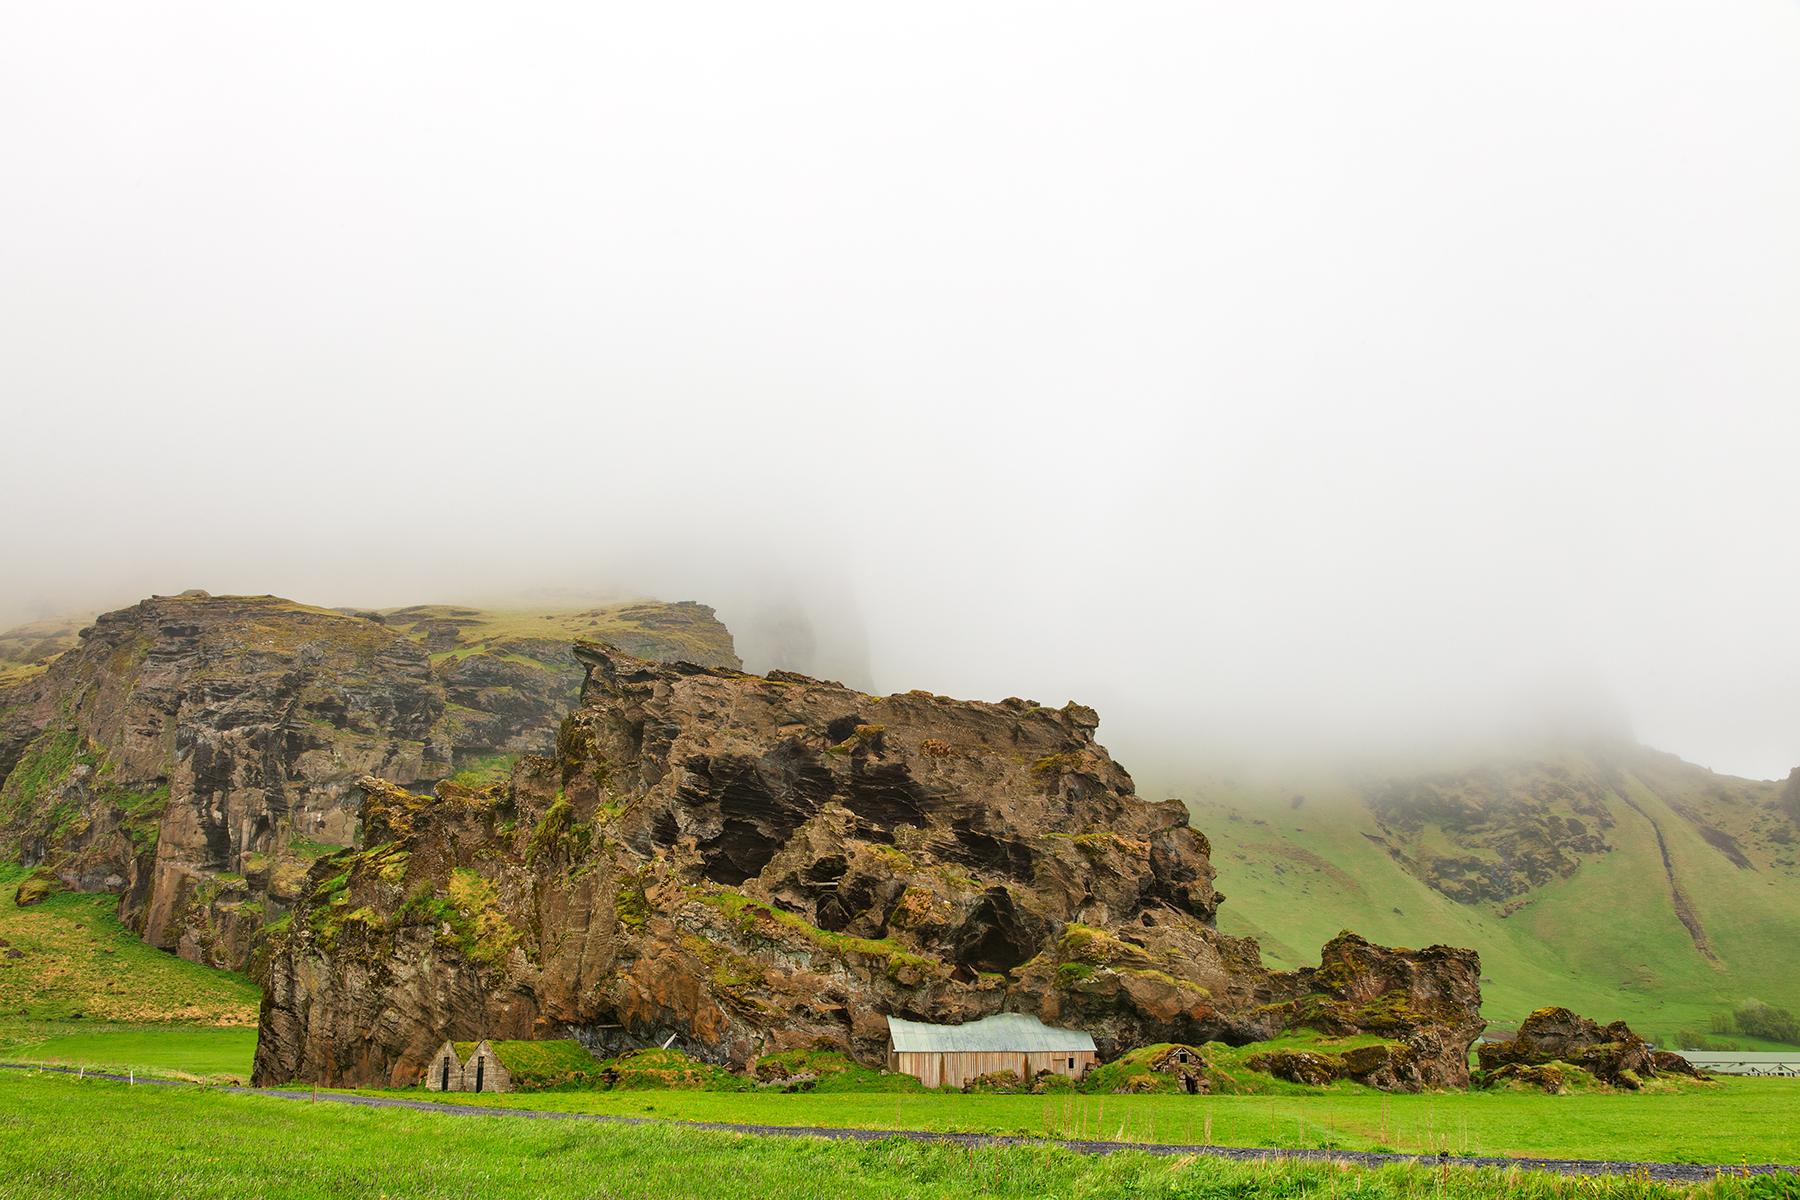 Rutshellir Fog, Age, Region, Seasonal, Season, HQ Photo